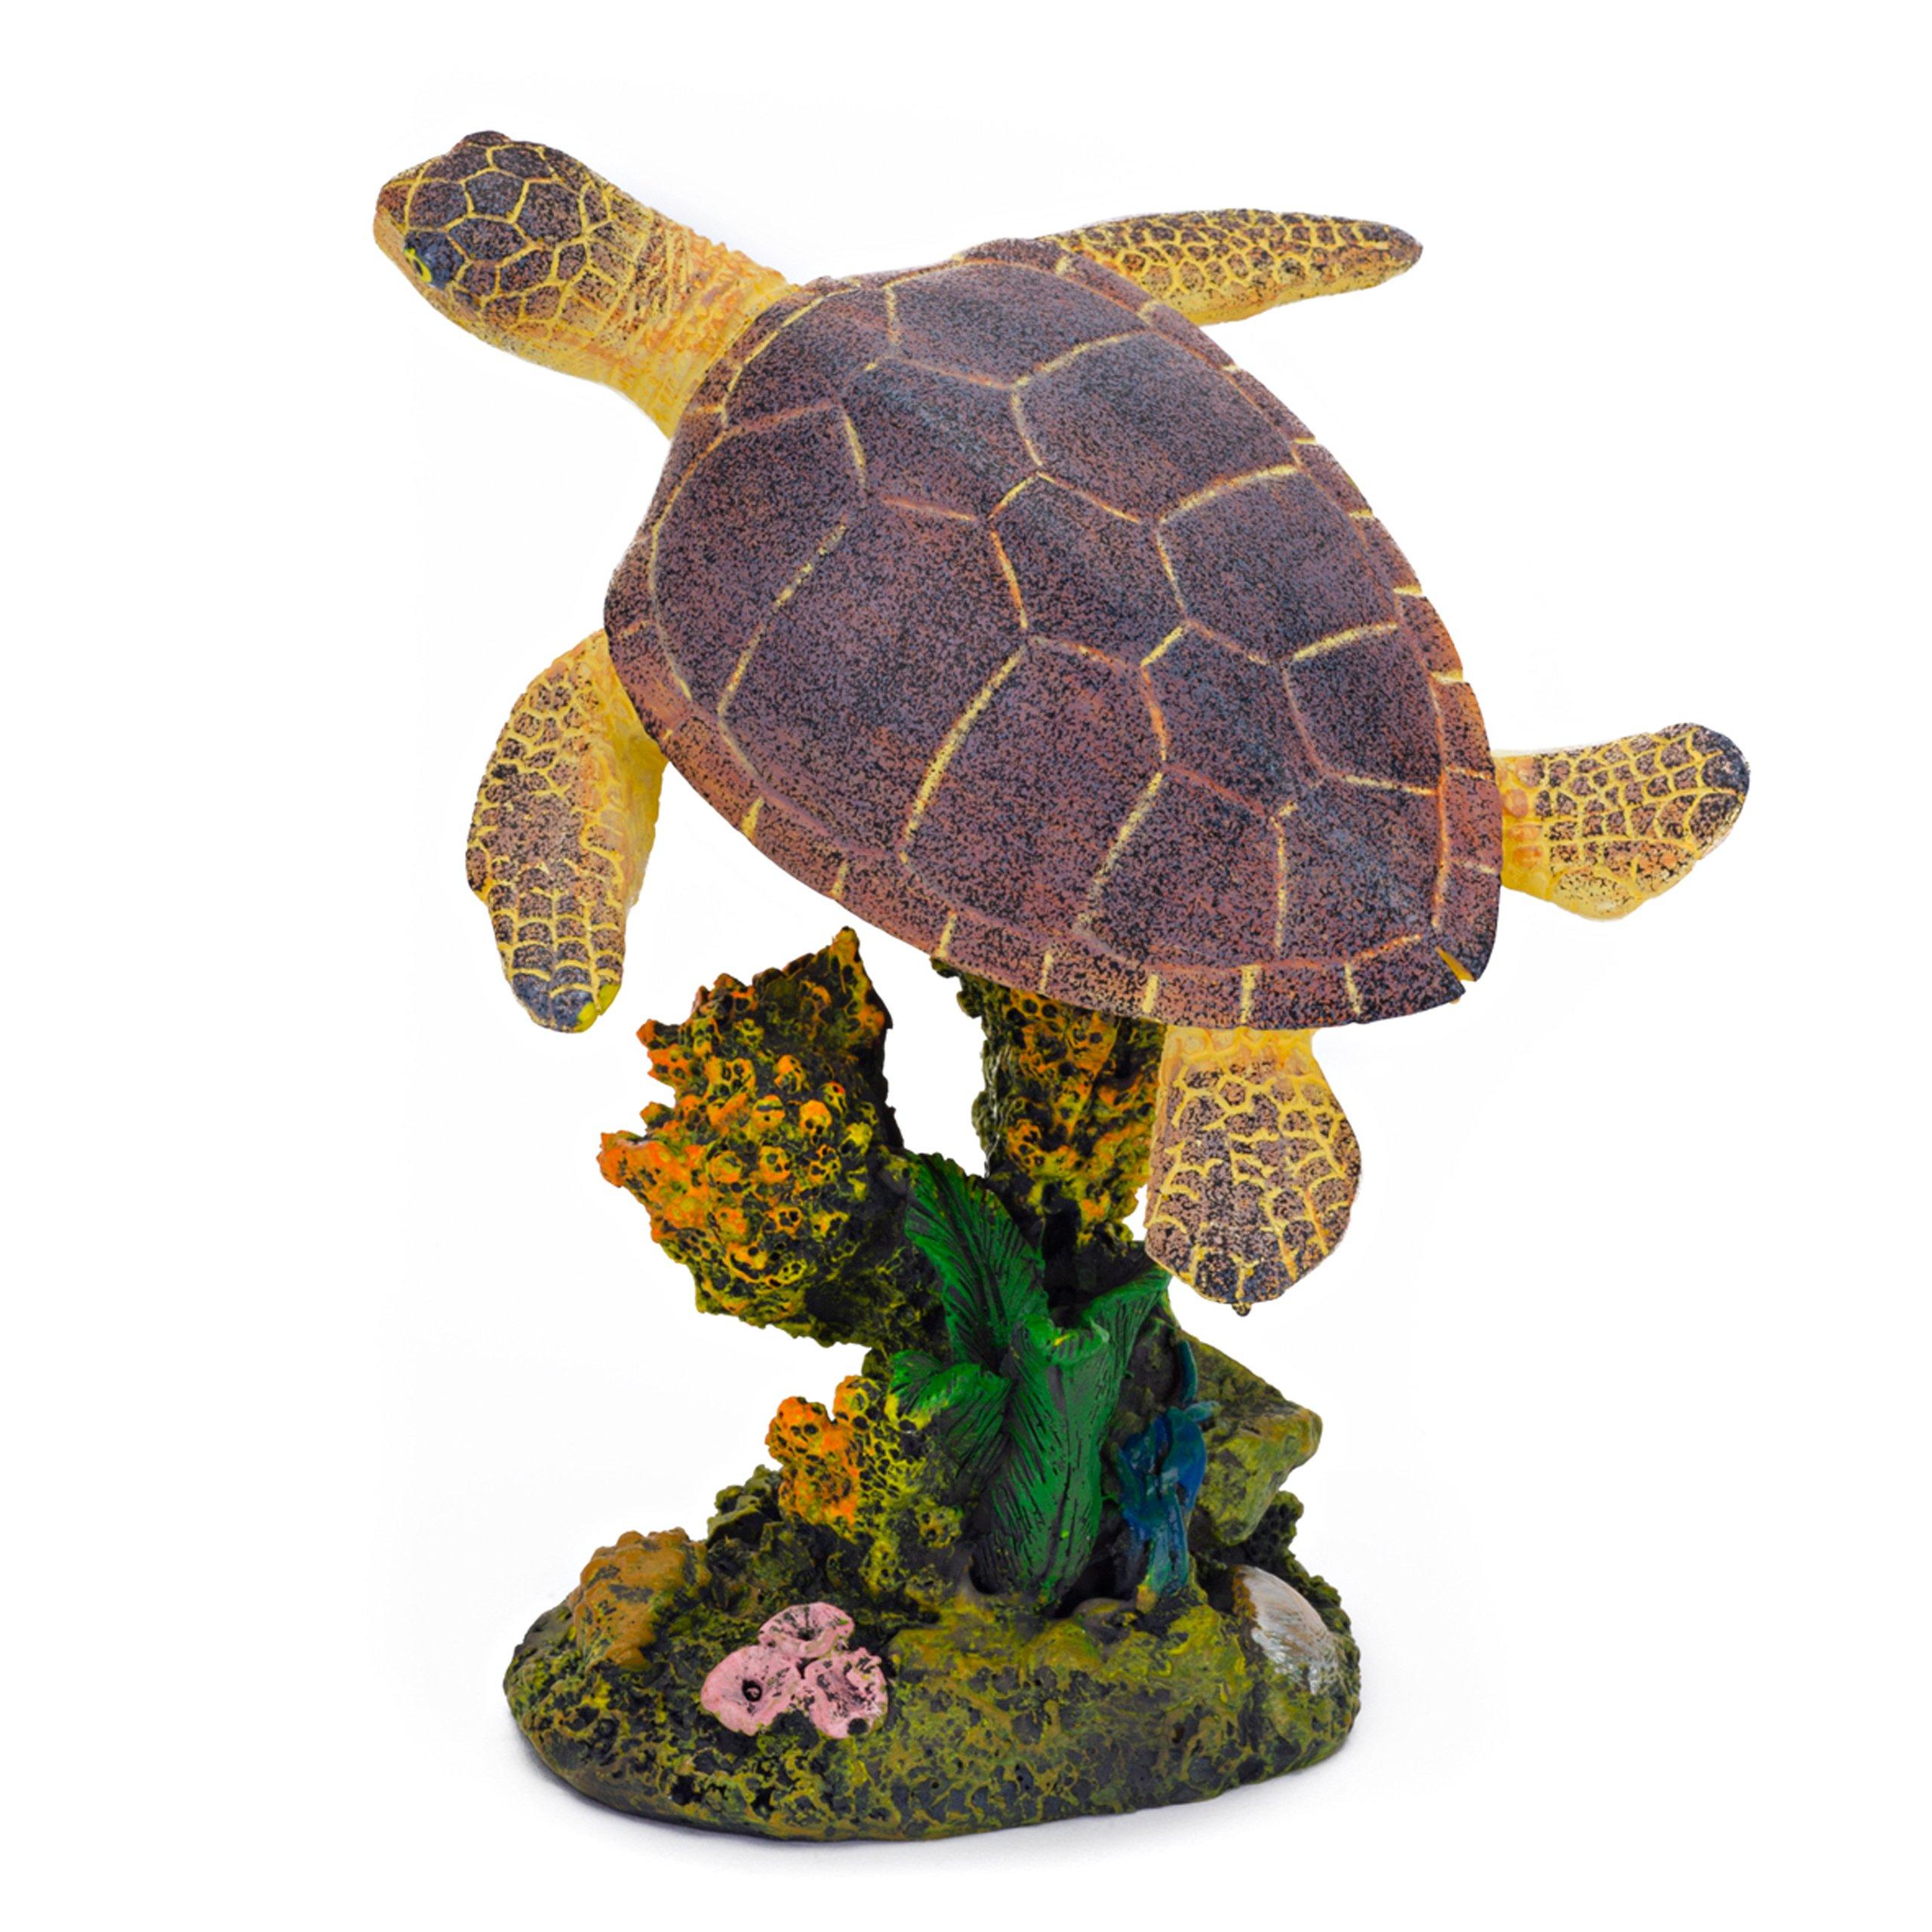 Penn Plax RR1107 Swimming Sea Turtle Aquarium Decor, Medium, Green